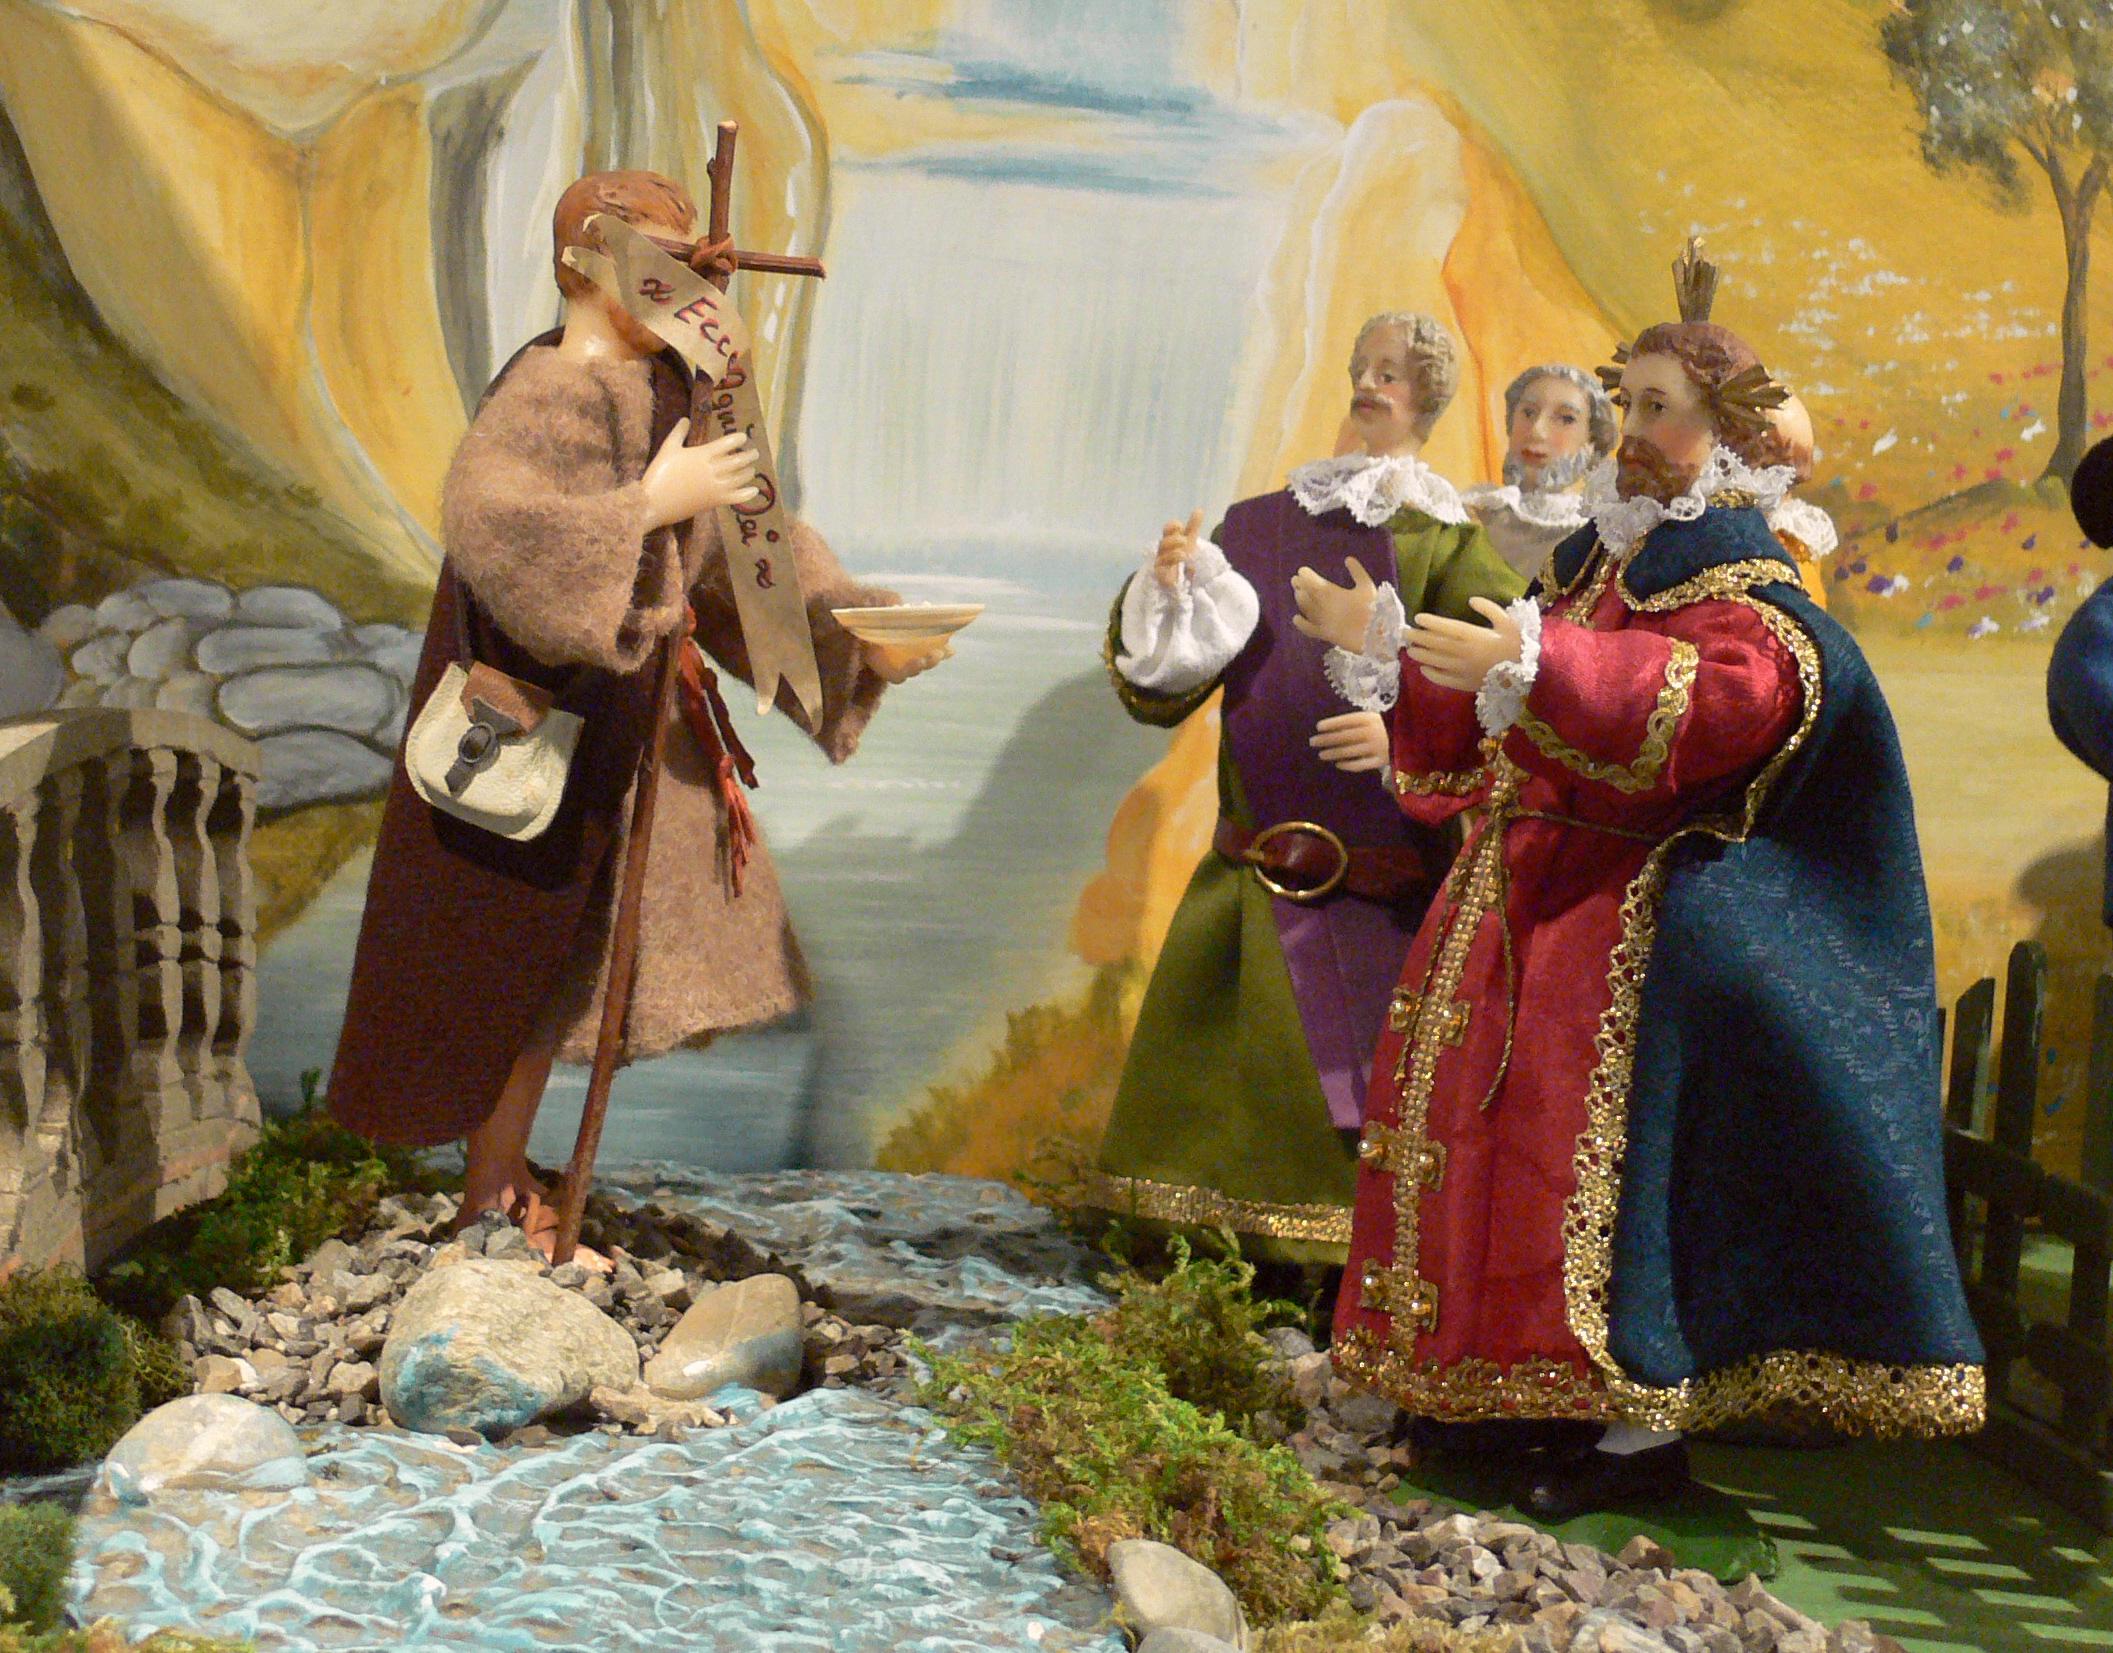 Filekrippe Barockstil Taufe Jesu Mfk Wgtjpg Wikimedia